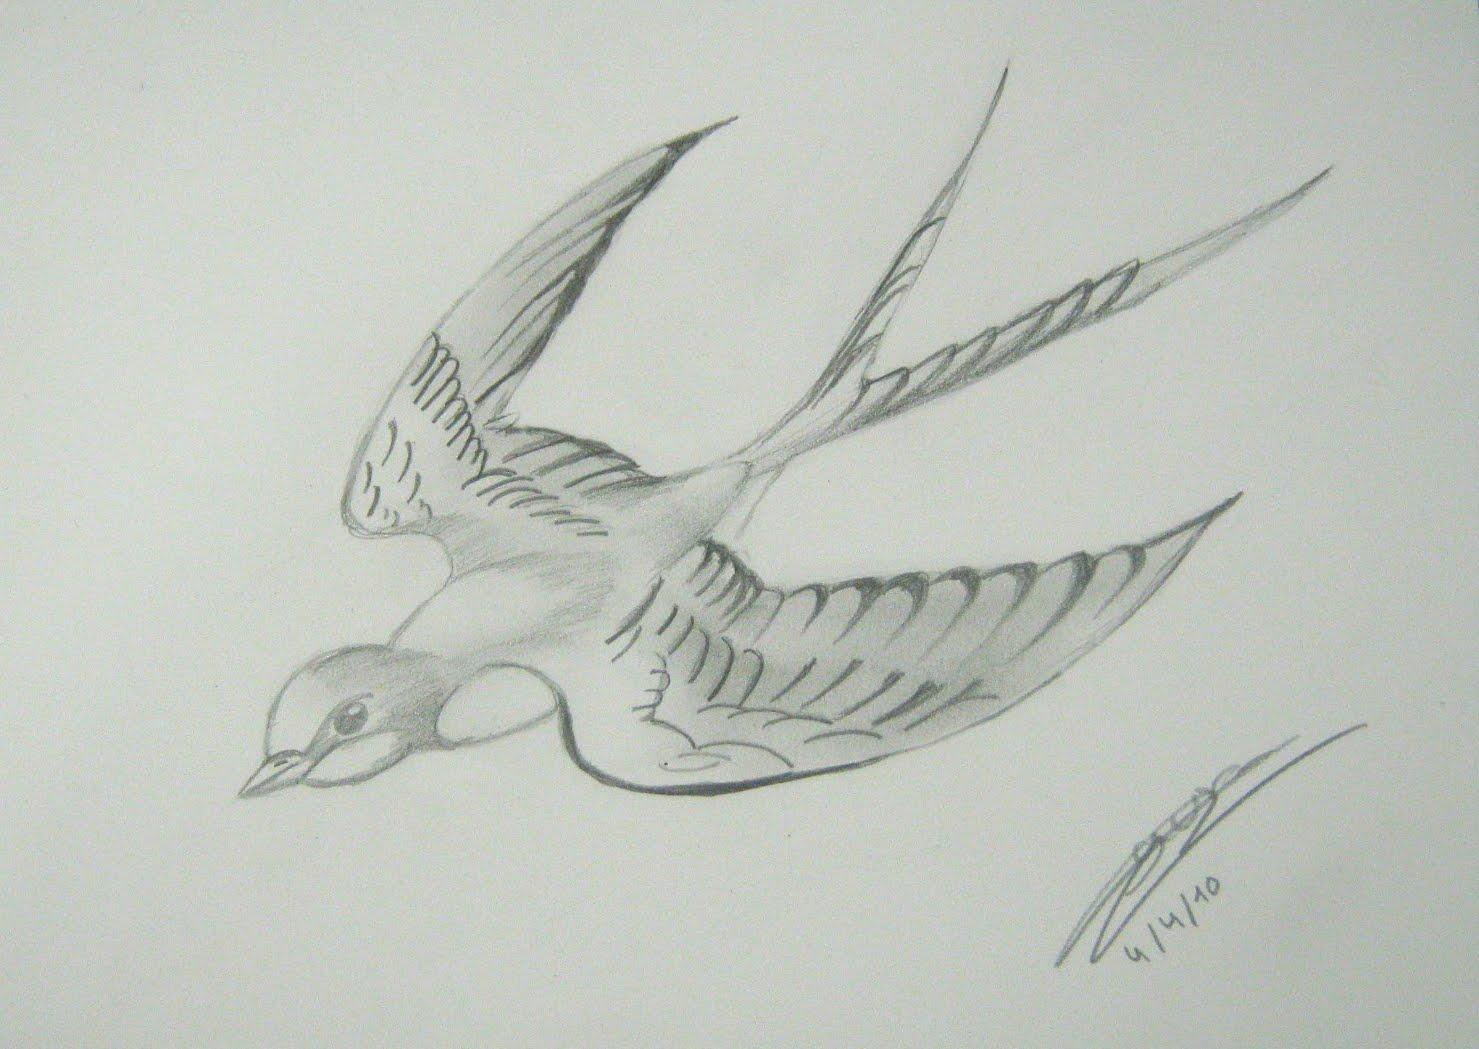 Pintasomnis MENUDOS Clases de Dibujo DIBUJANDO AVES